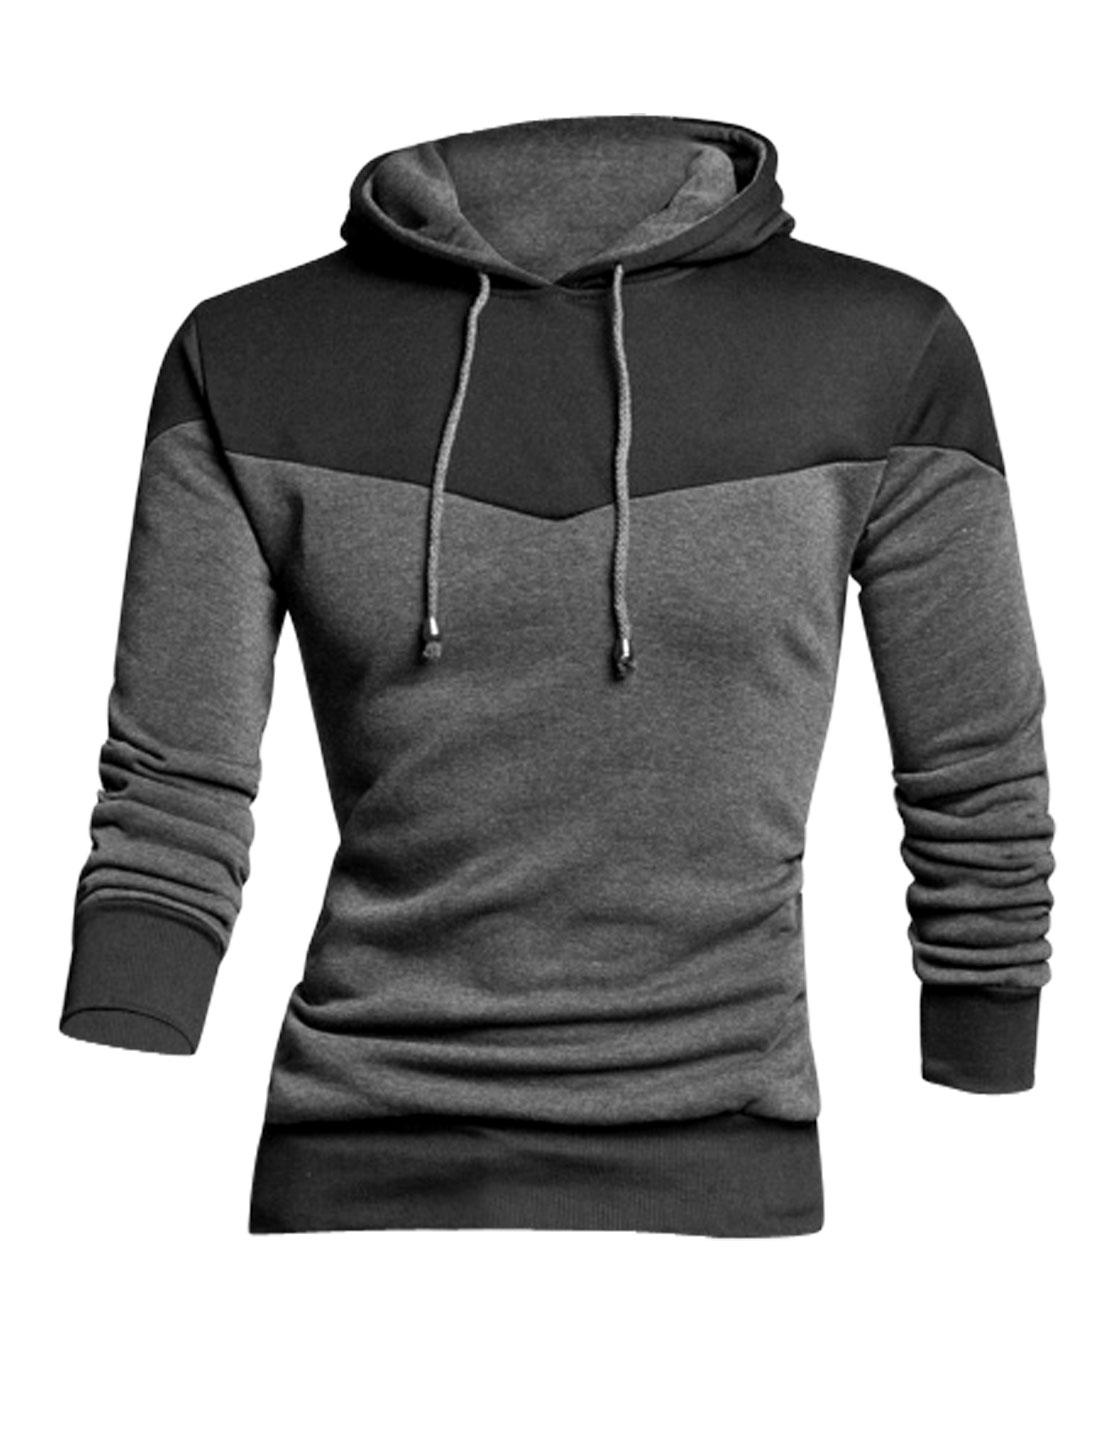 Men Long Sleeve Contrast Color Pullover Chic Sweatshirt Dark Gray M